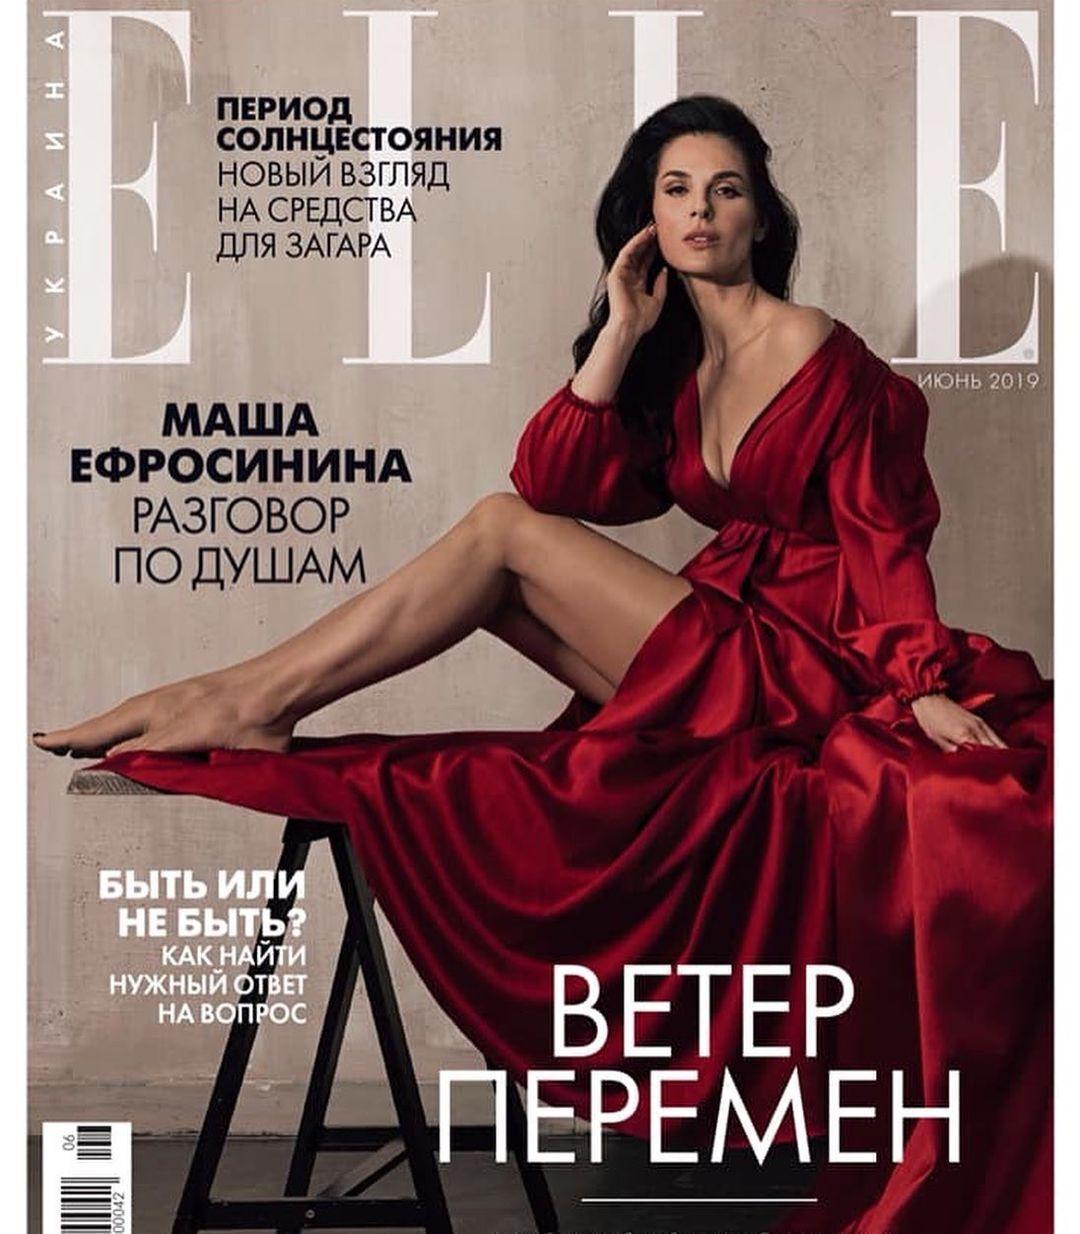 Маша Ефросинина на обложке журнала в 2019 году